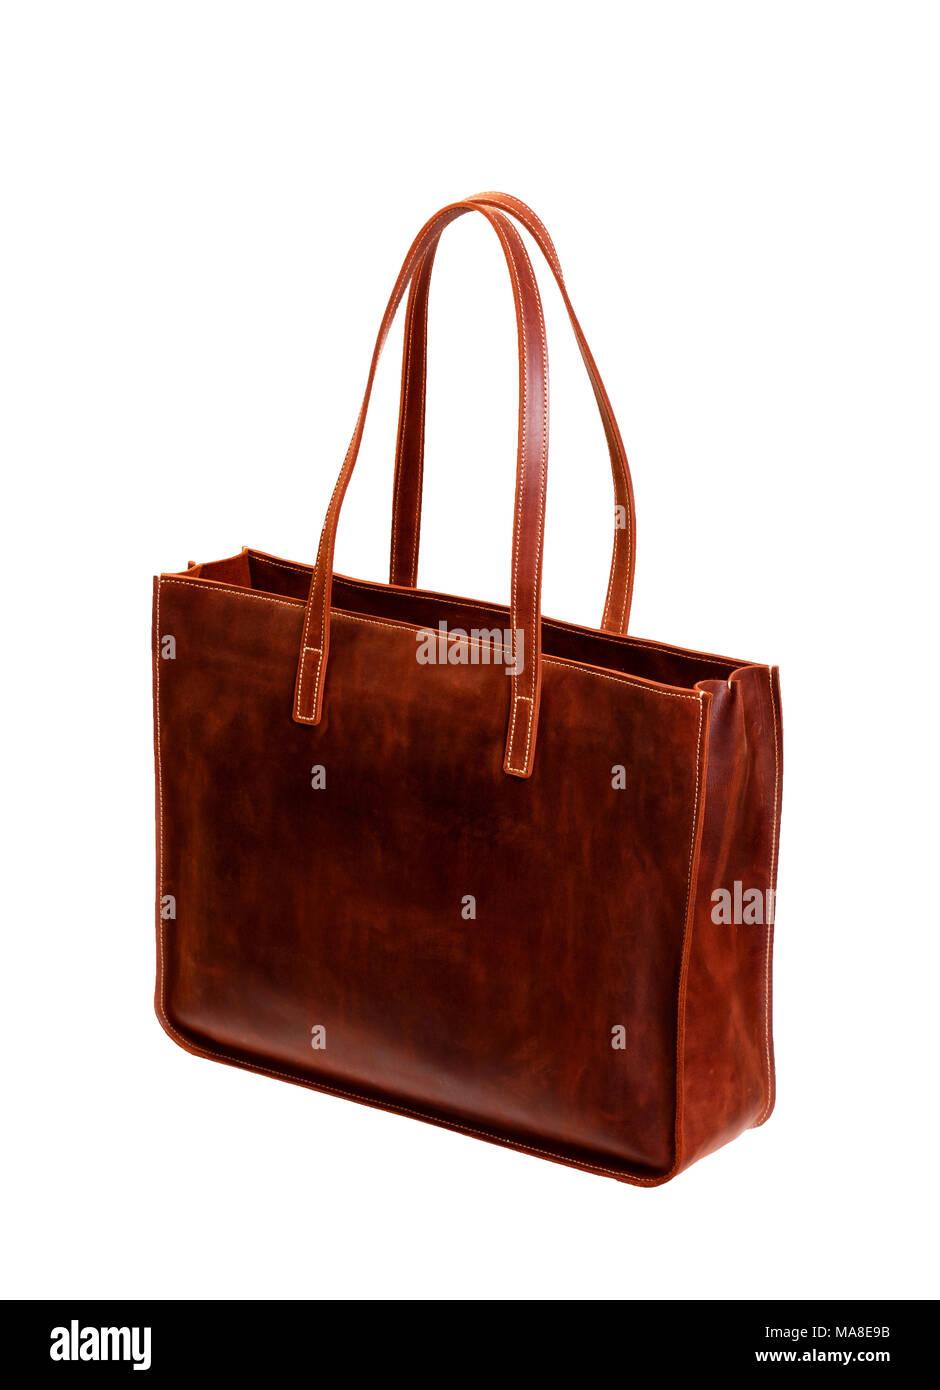 A leathern handbag on a white background - Stock Image